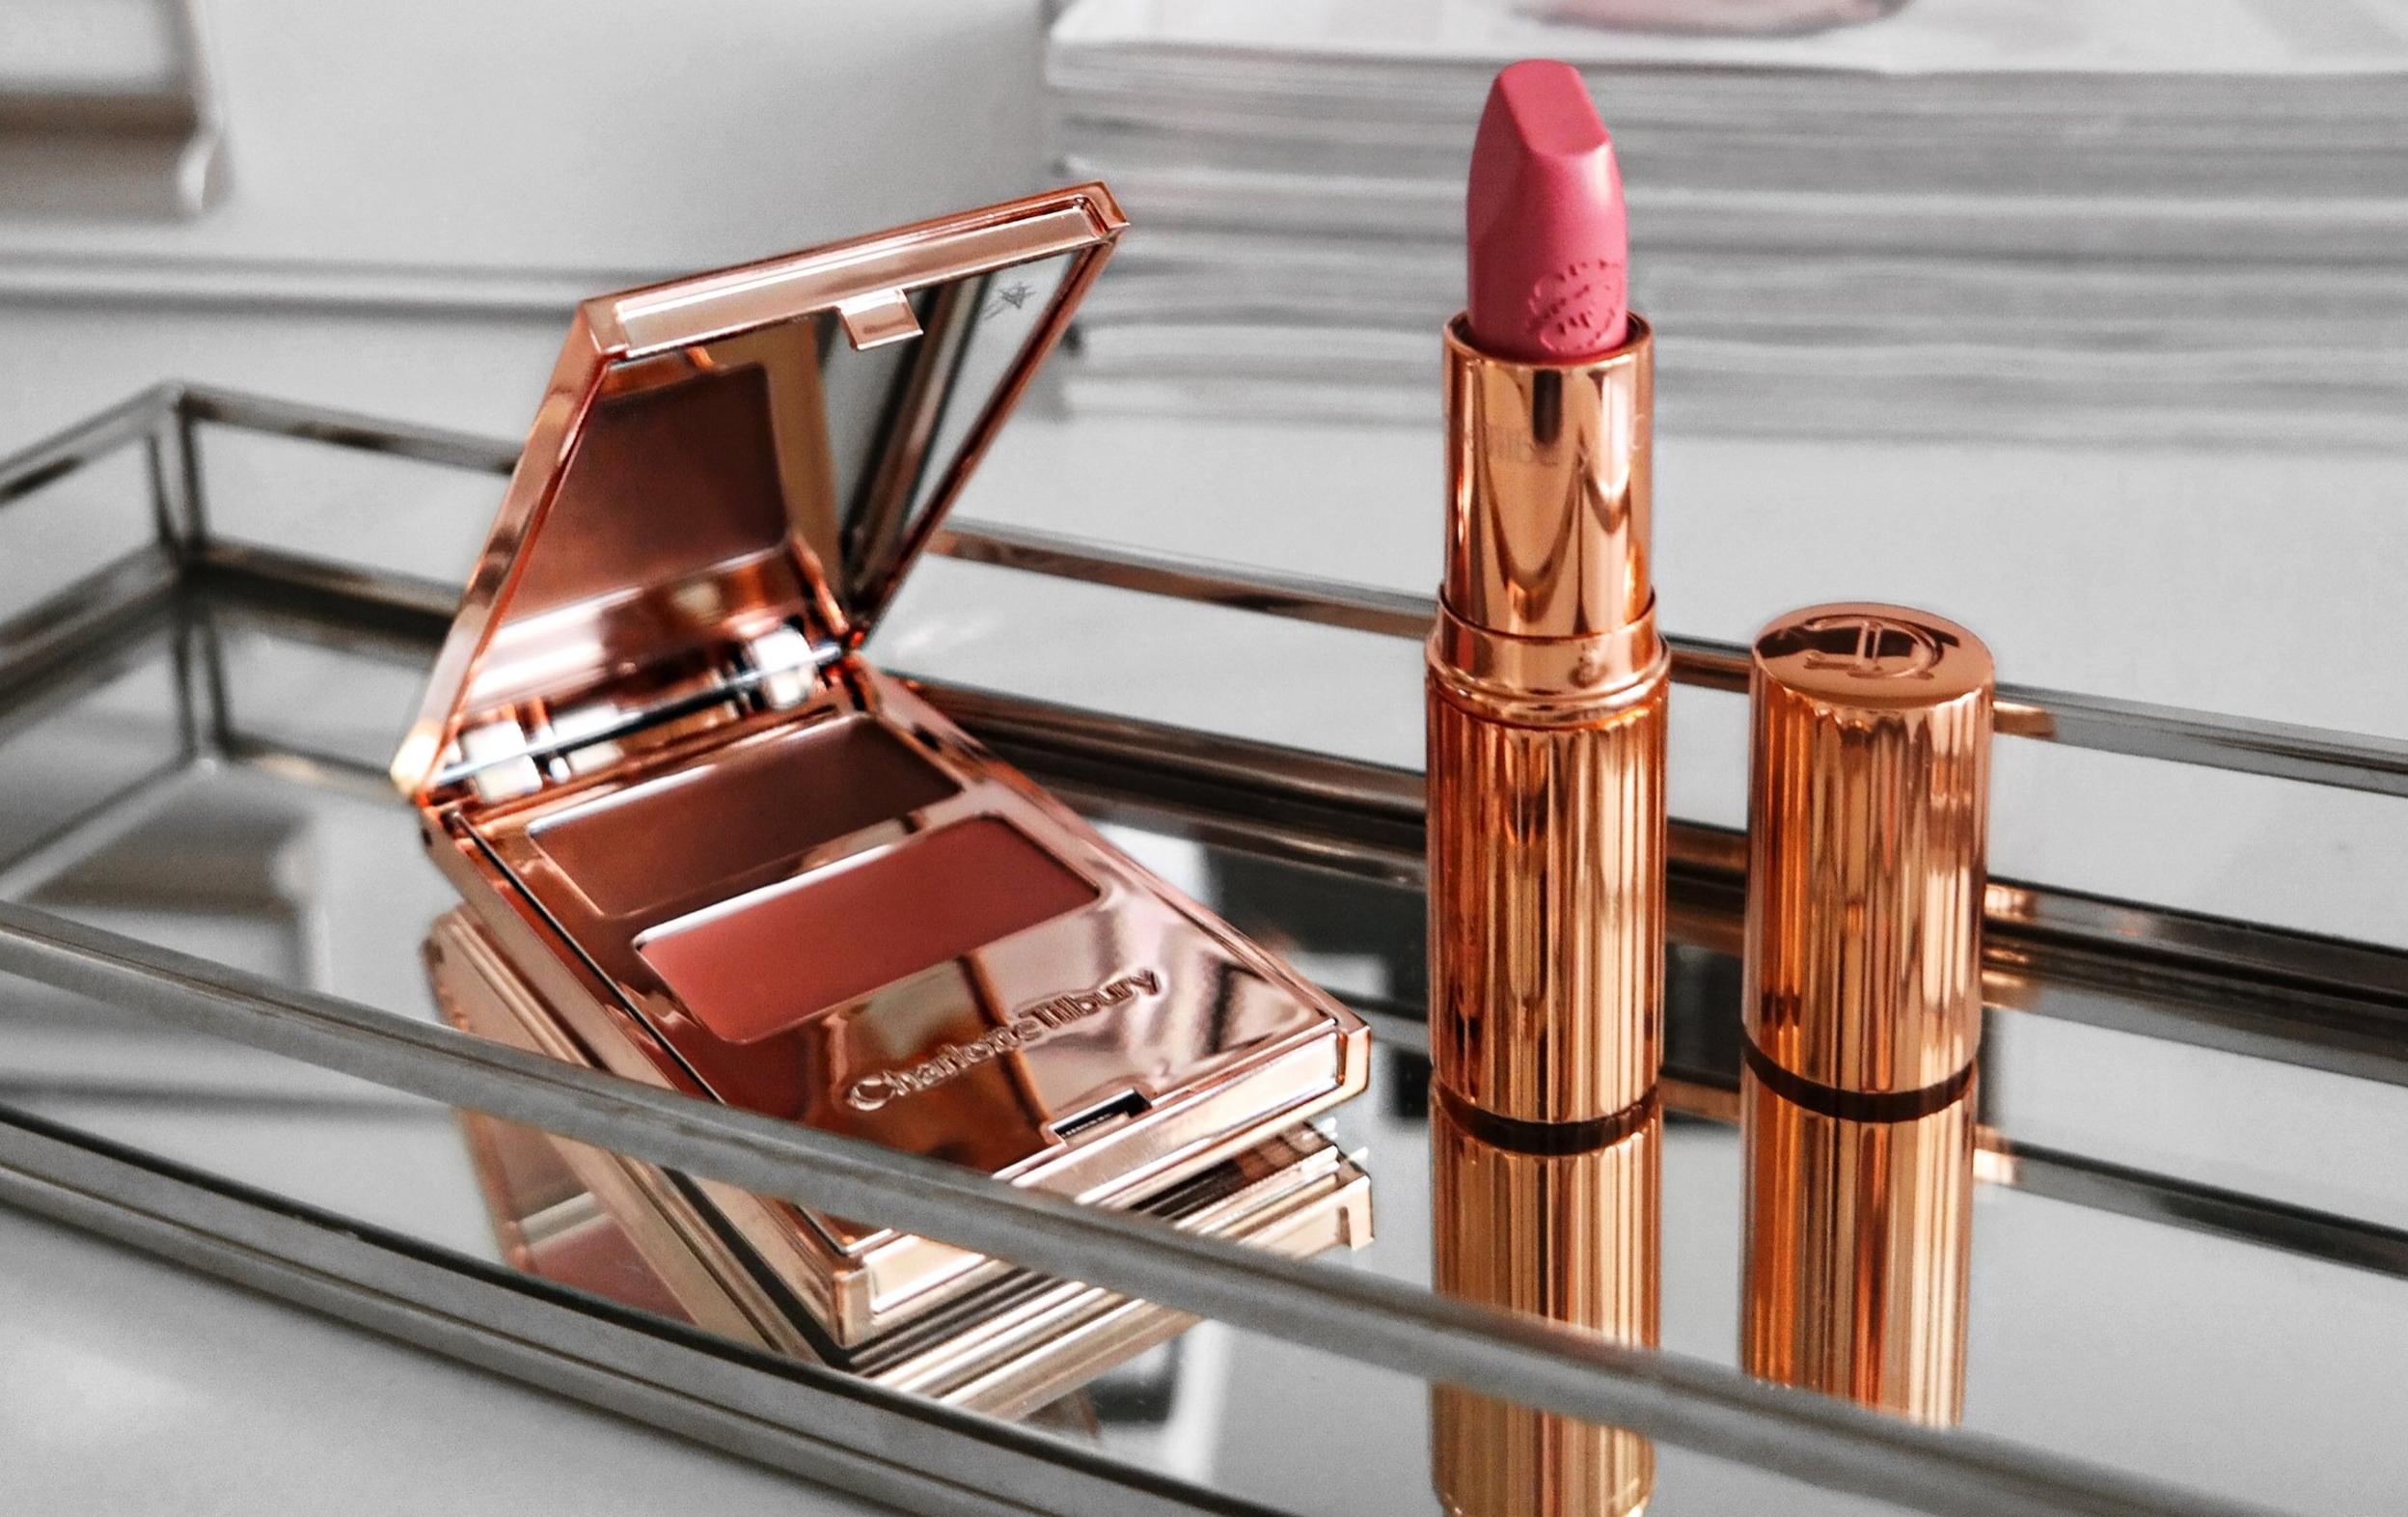 Charlotte Tilbury Lipstick in shade Liv It Up